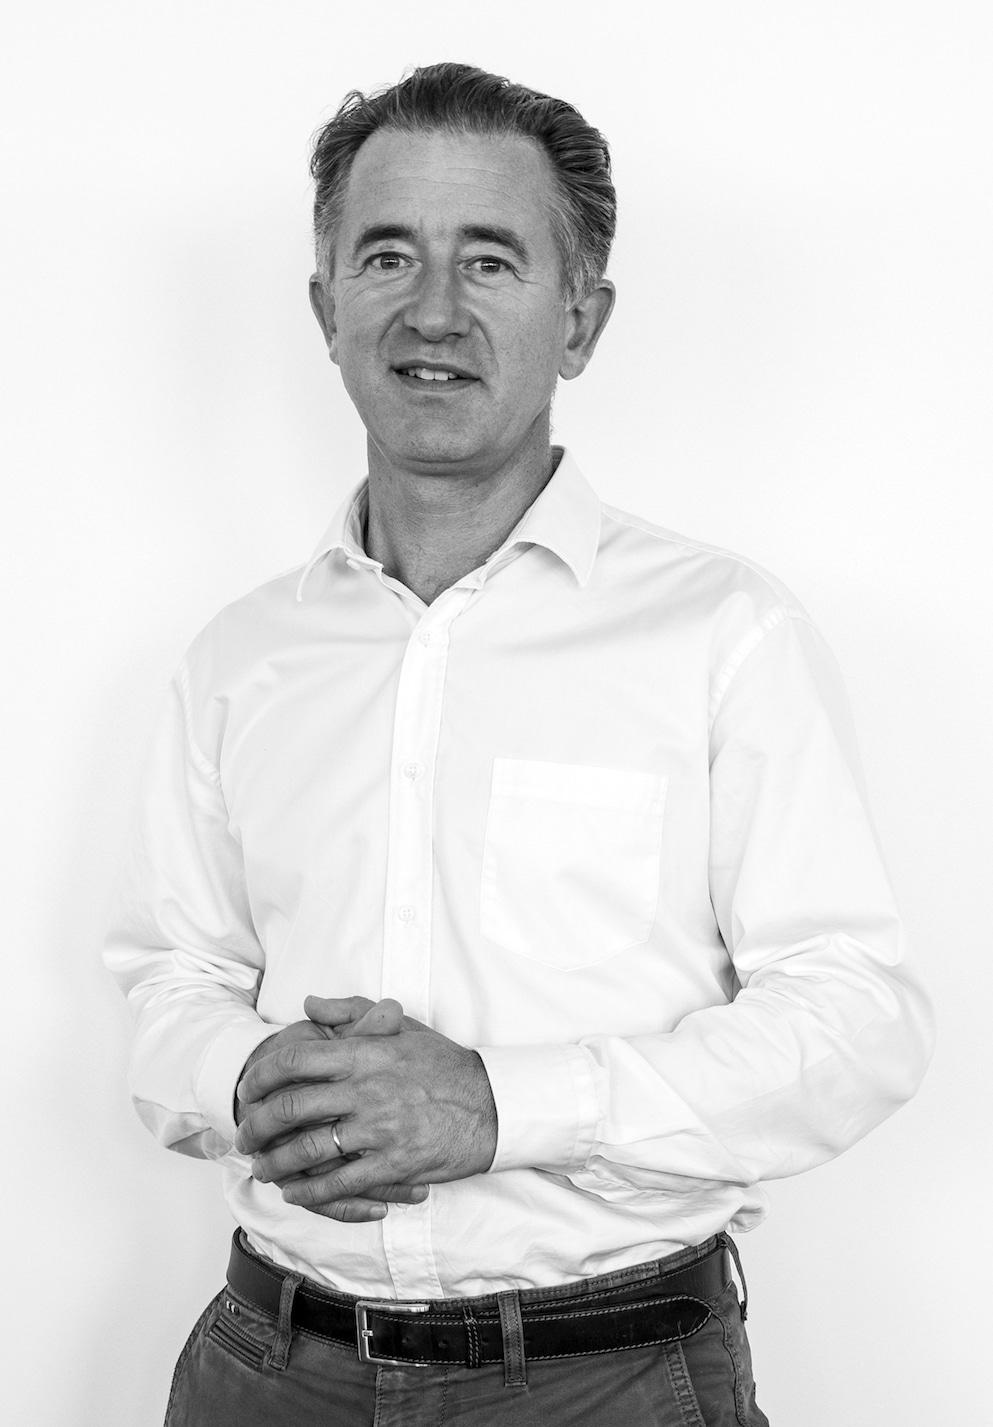 Frederic Ploix CSO of MyDataModels